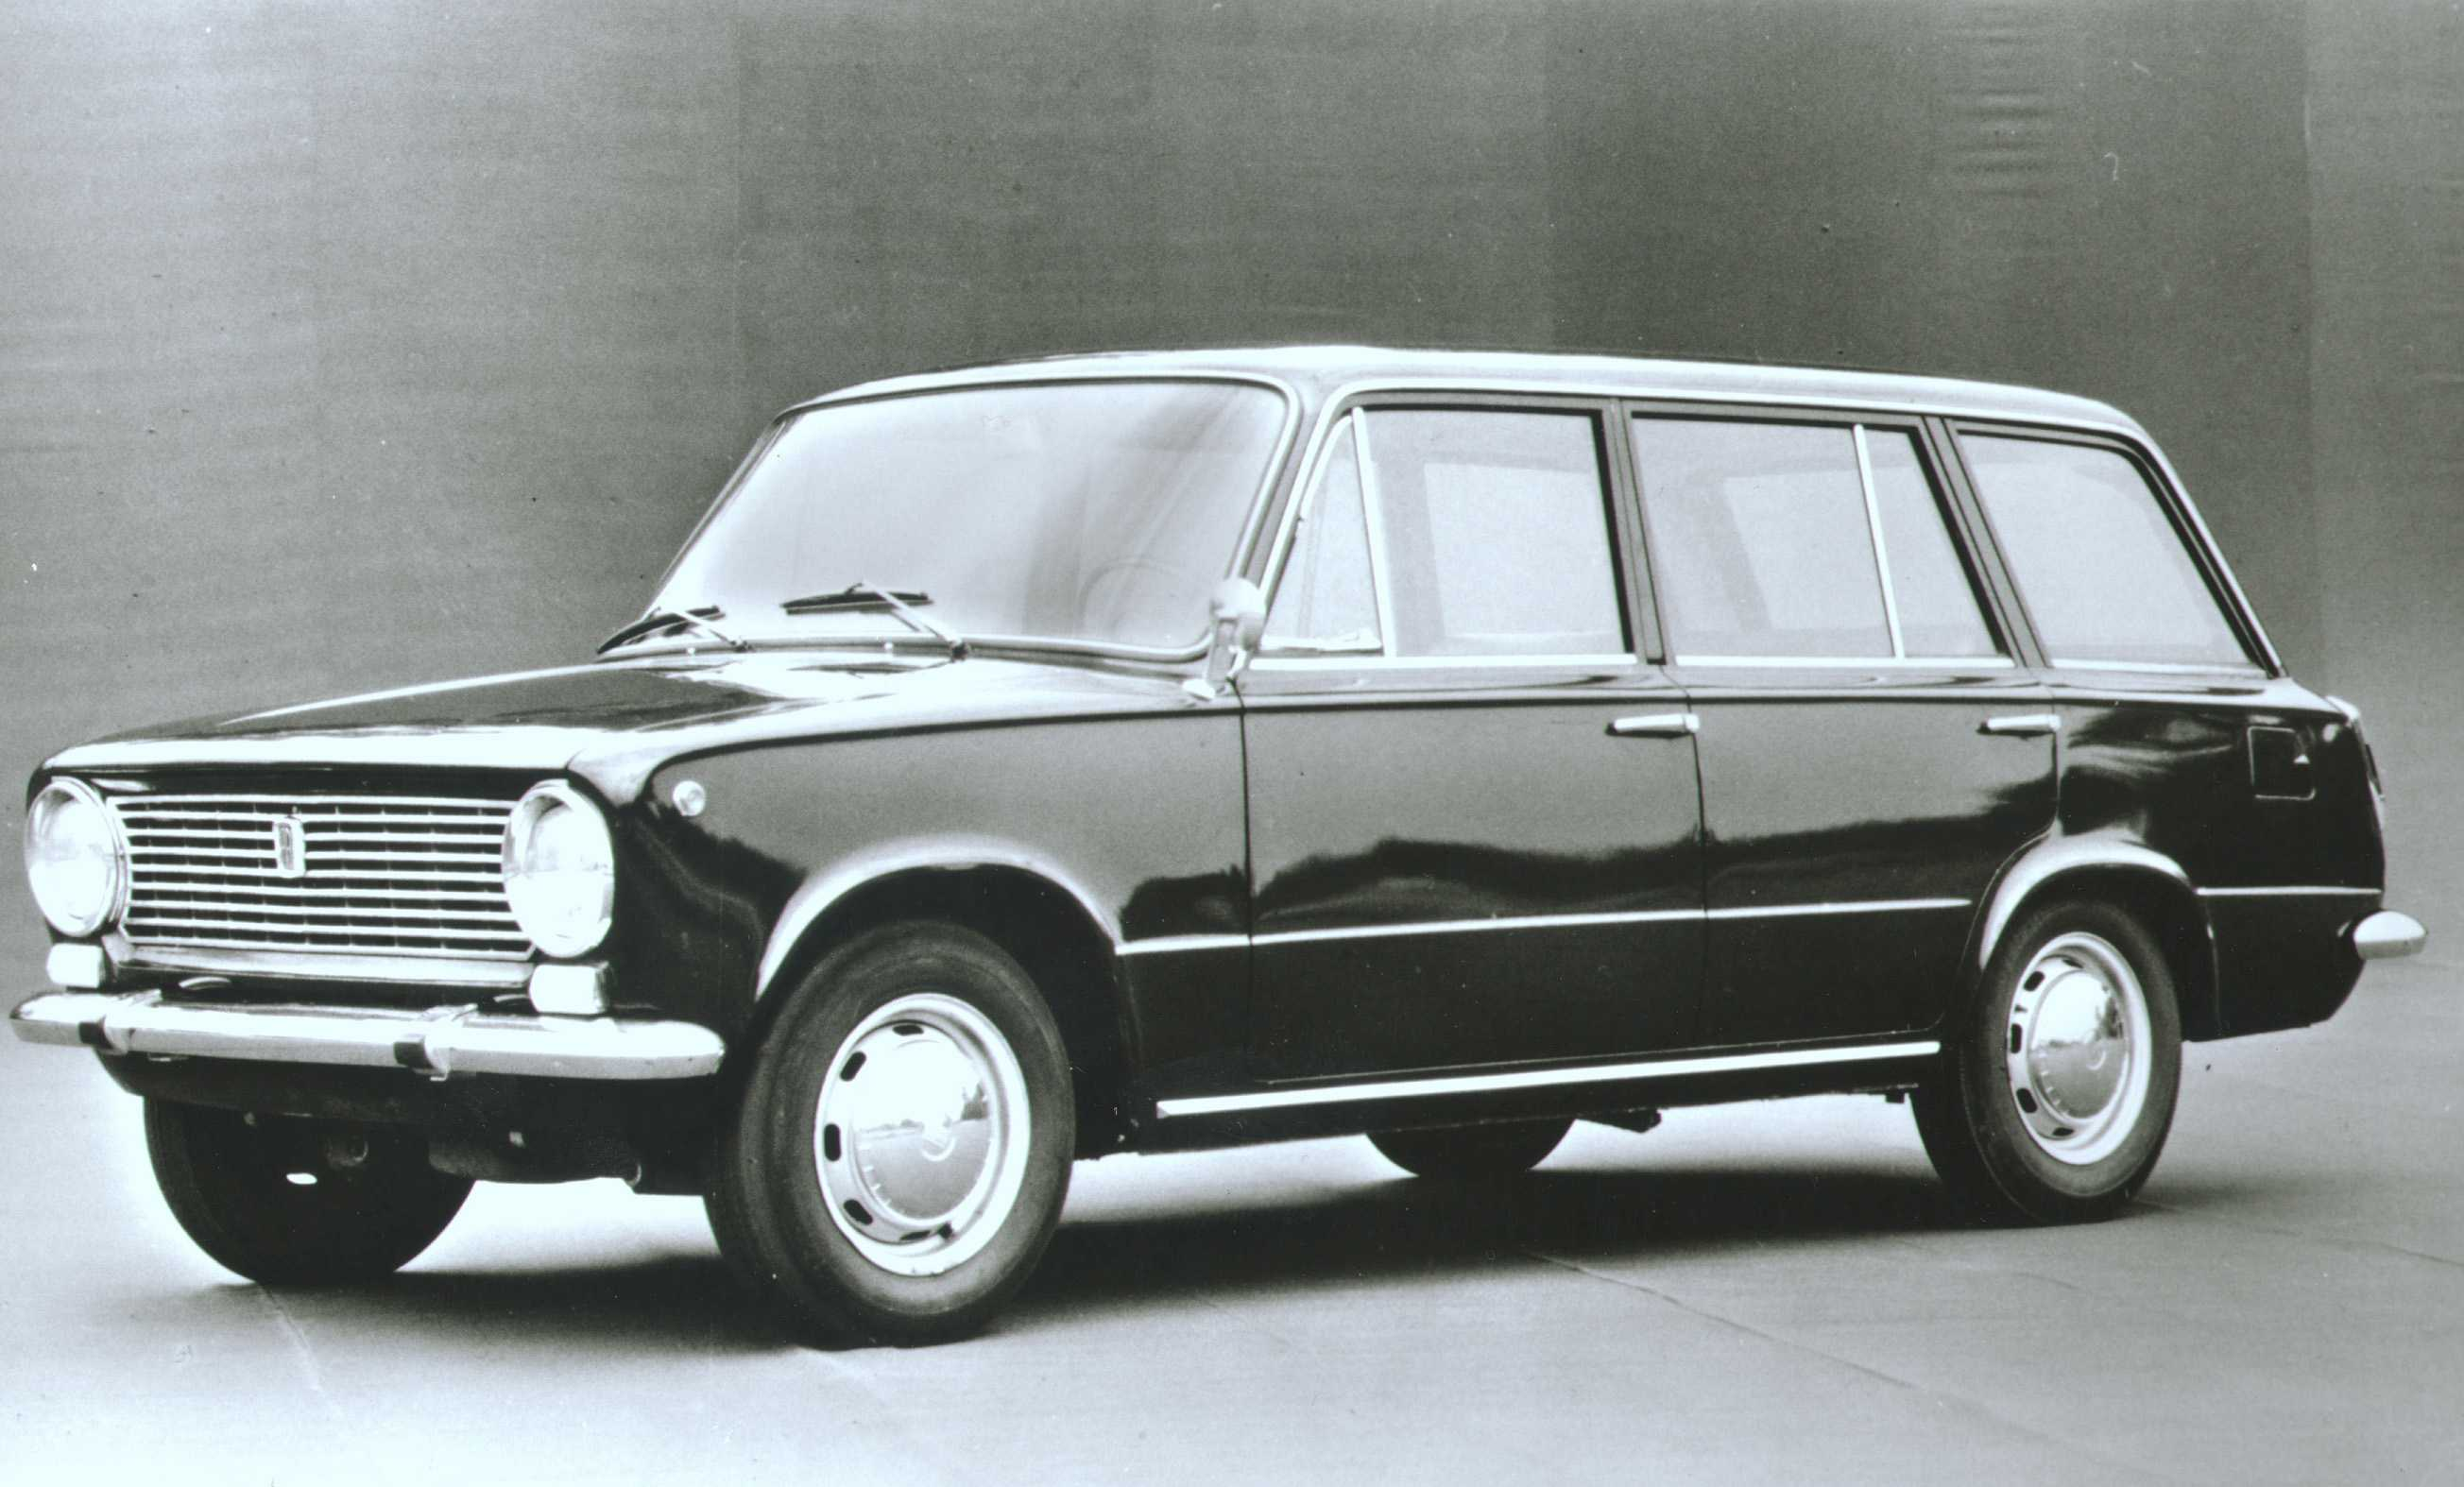 Fiat 124 Station Wagon 1.2 Manual, 60hp, 1966